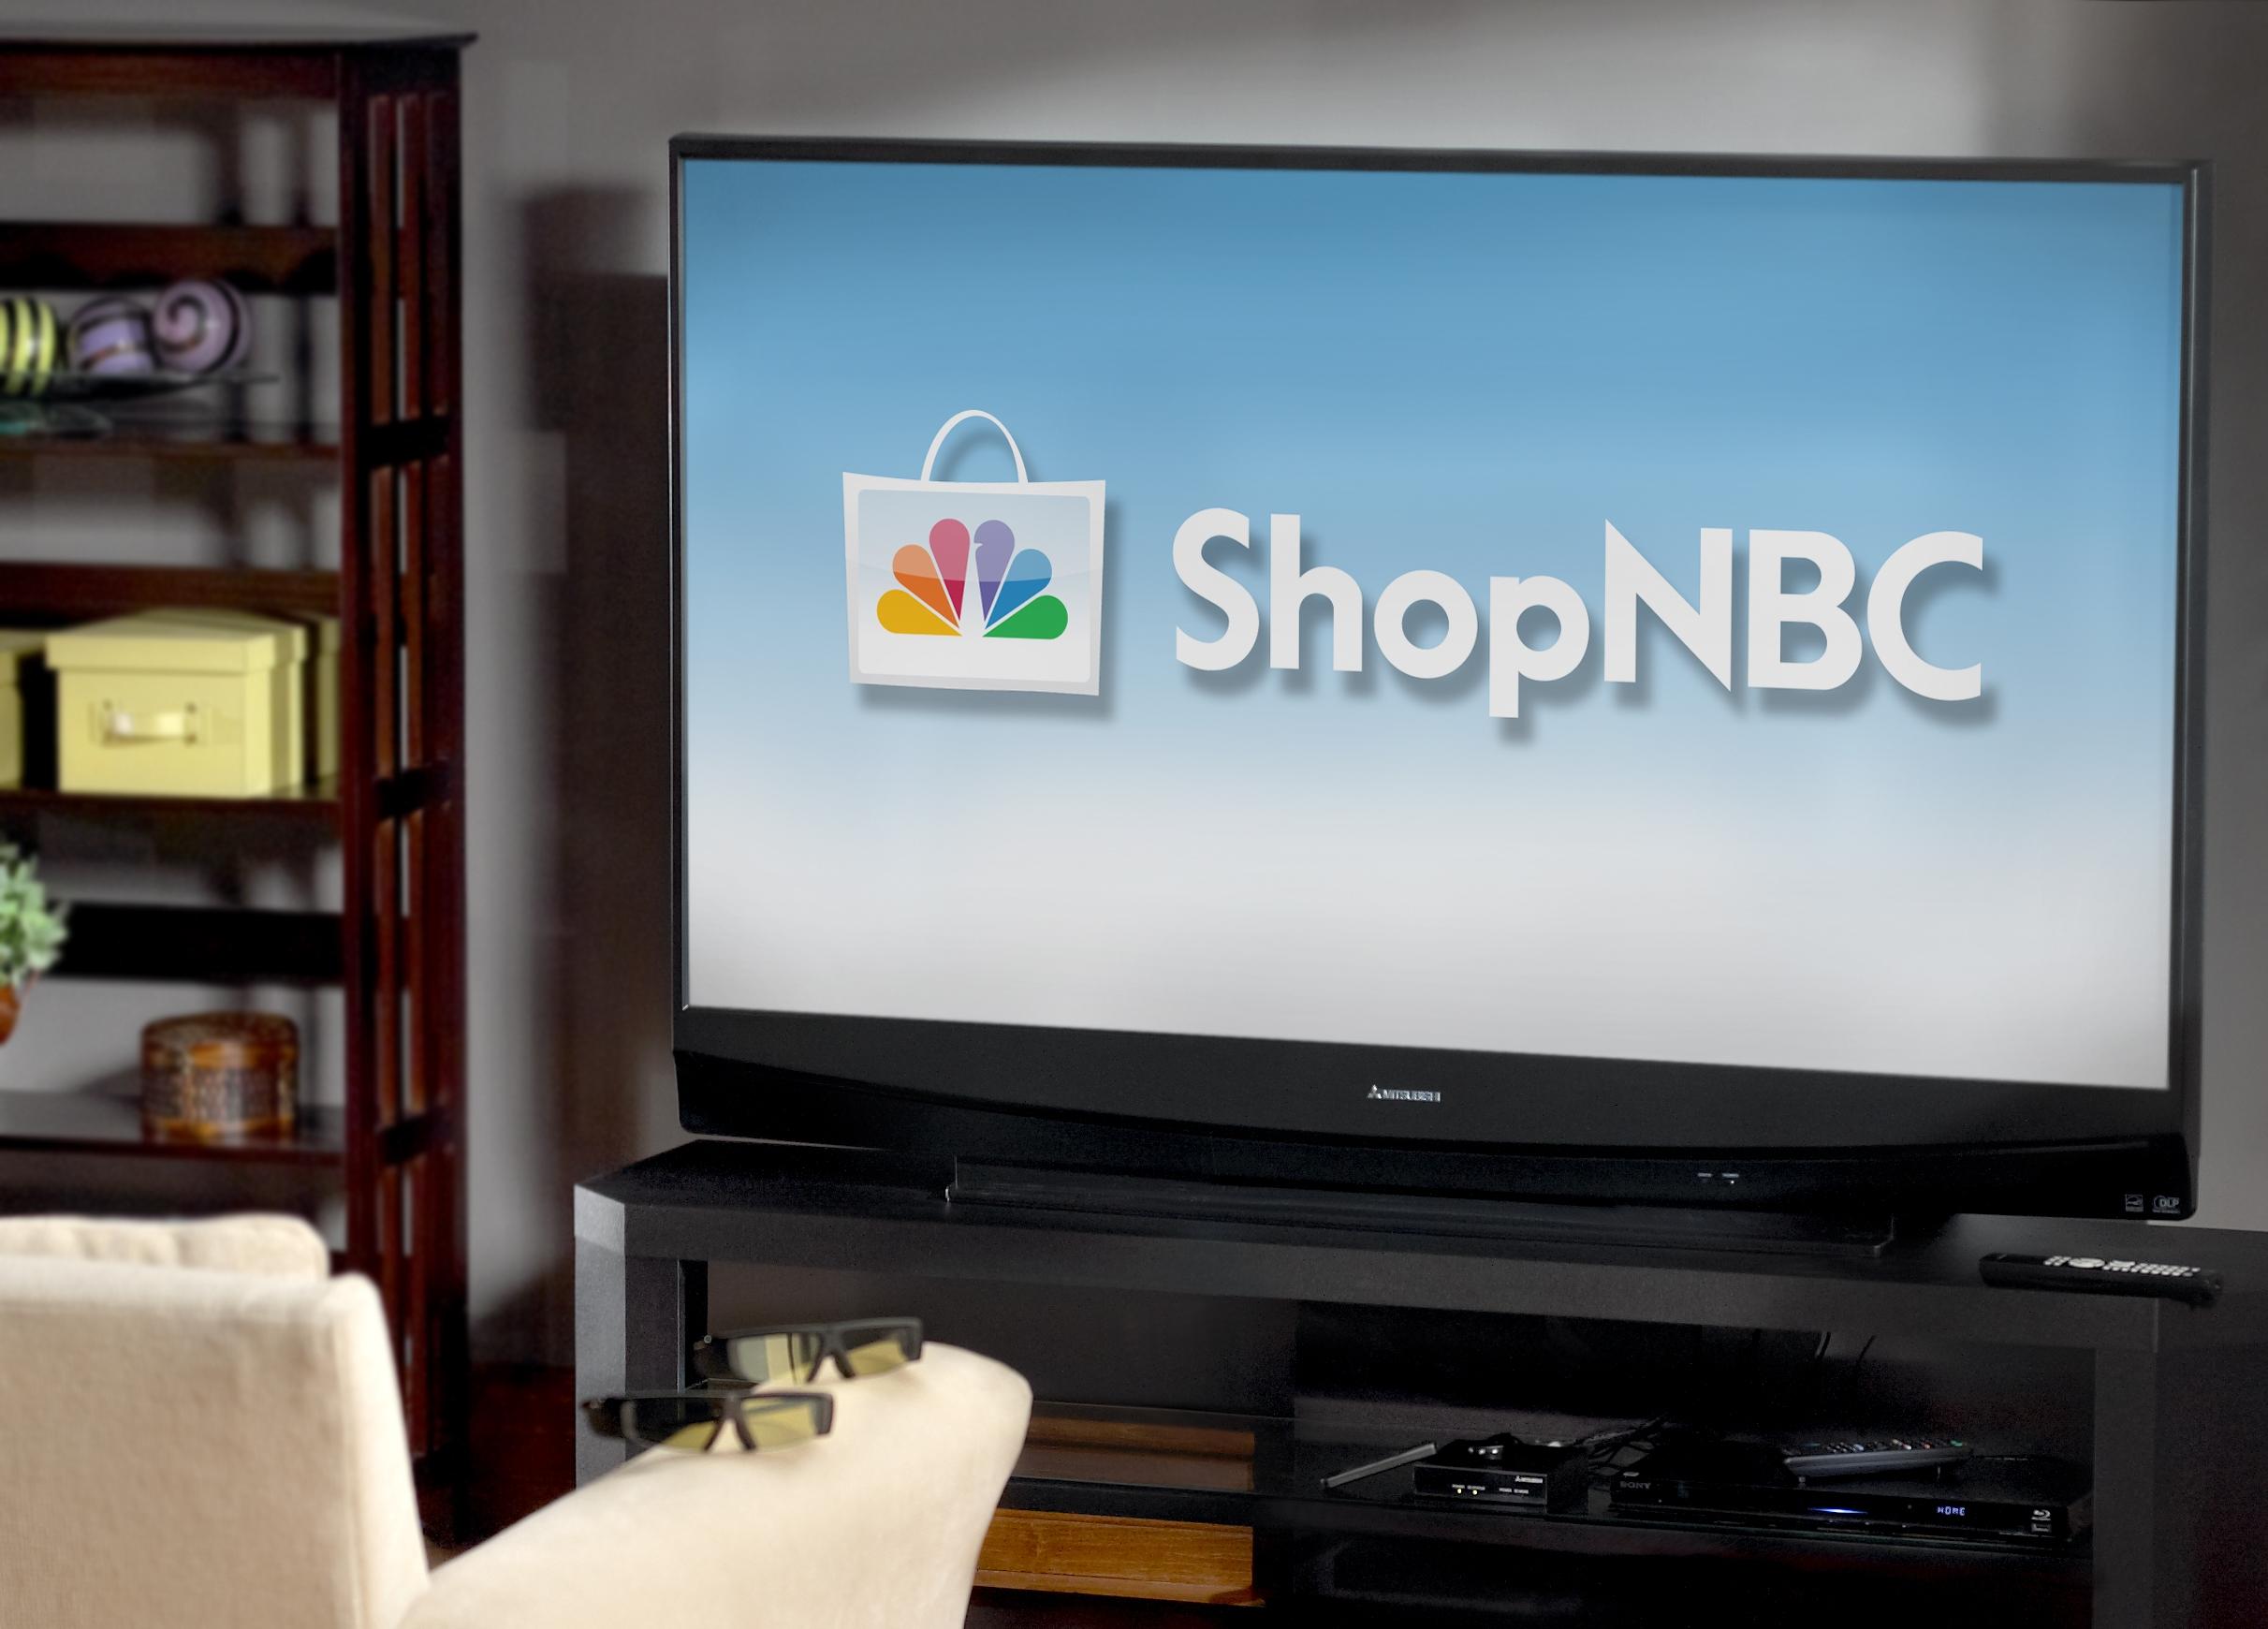 ShopNBCu0027s Mitsubishi 65 Inch HDTV. U201c